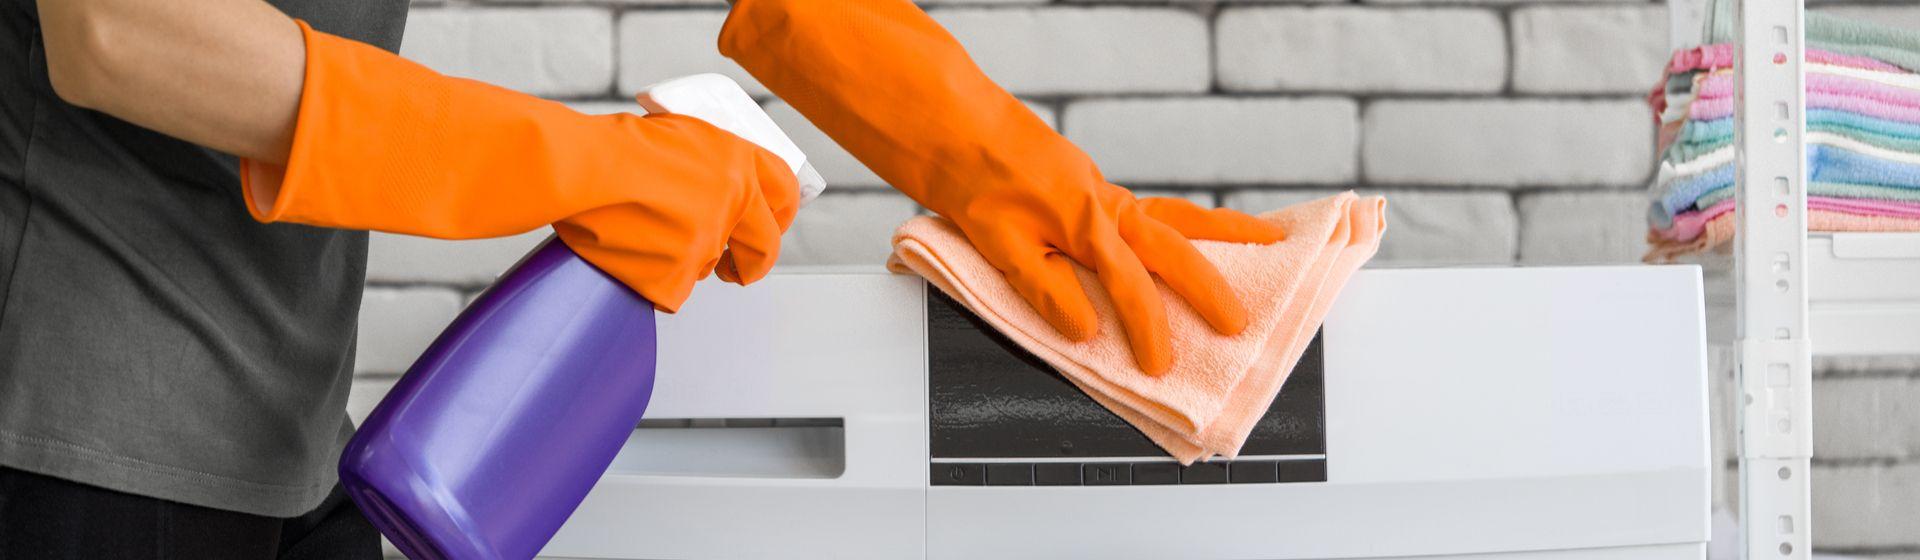 Como limpar máquina de lavar roupas